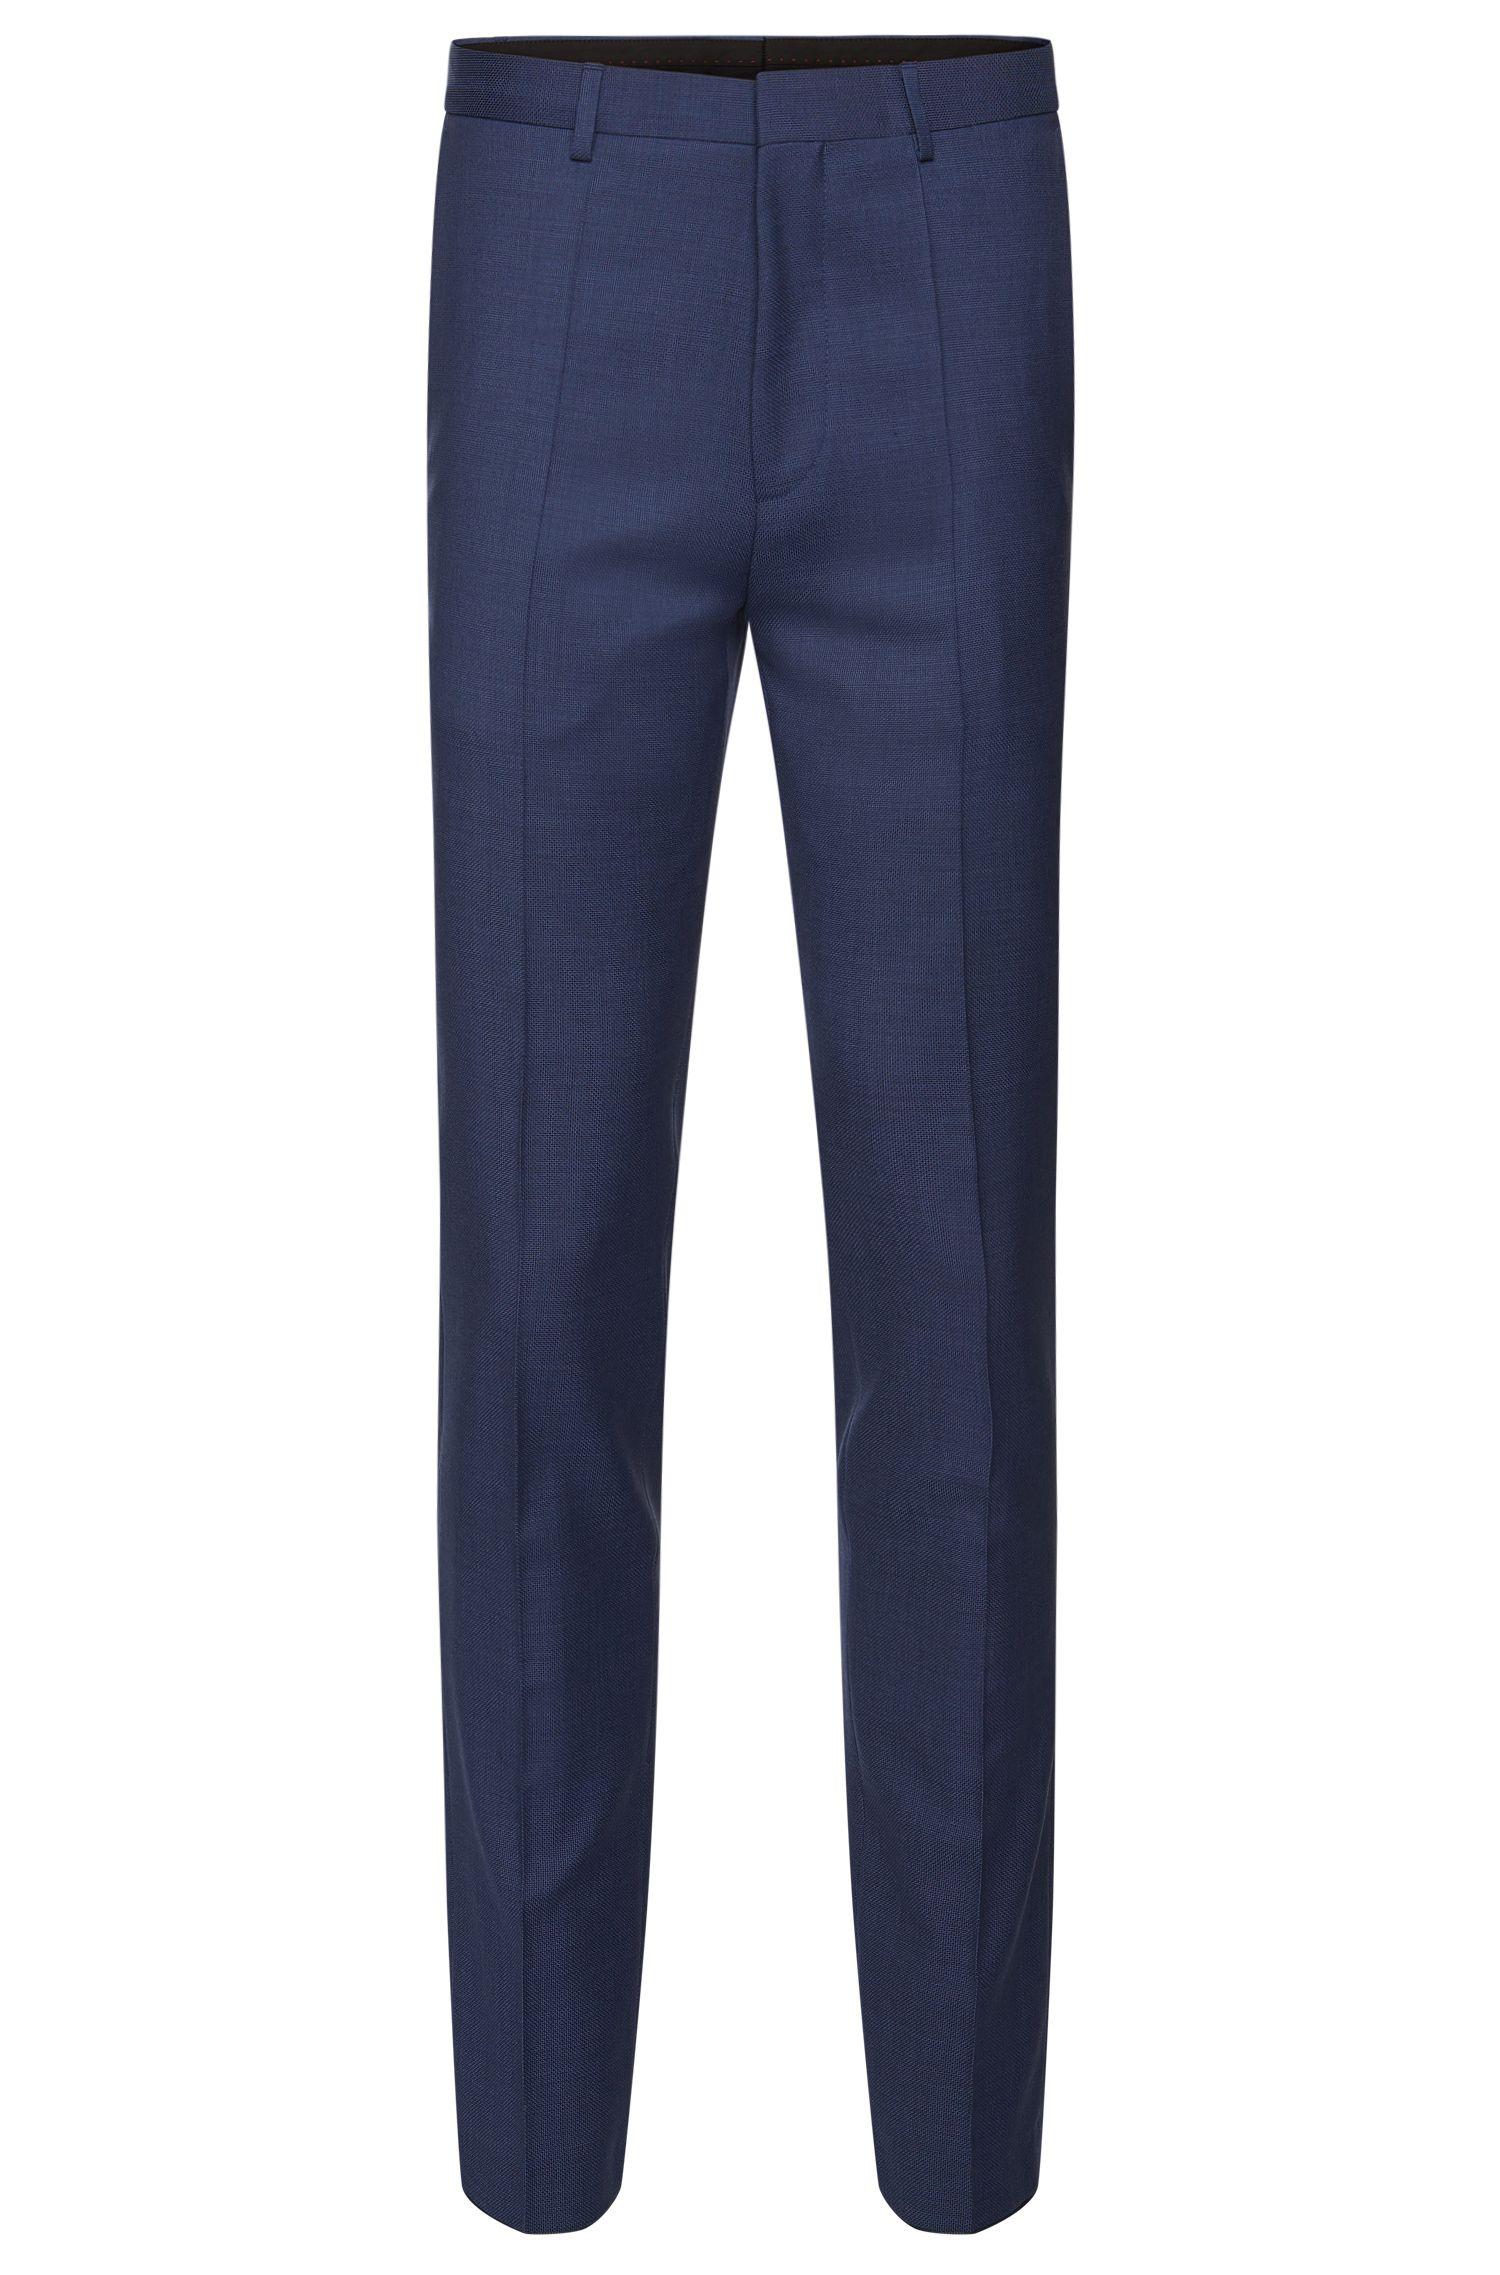 Pantalón extra slim fit en lana virgen con textura fina: 'HerioS'